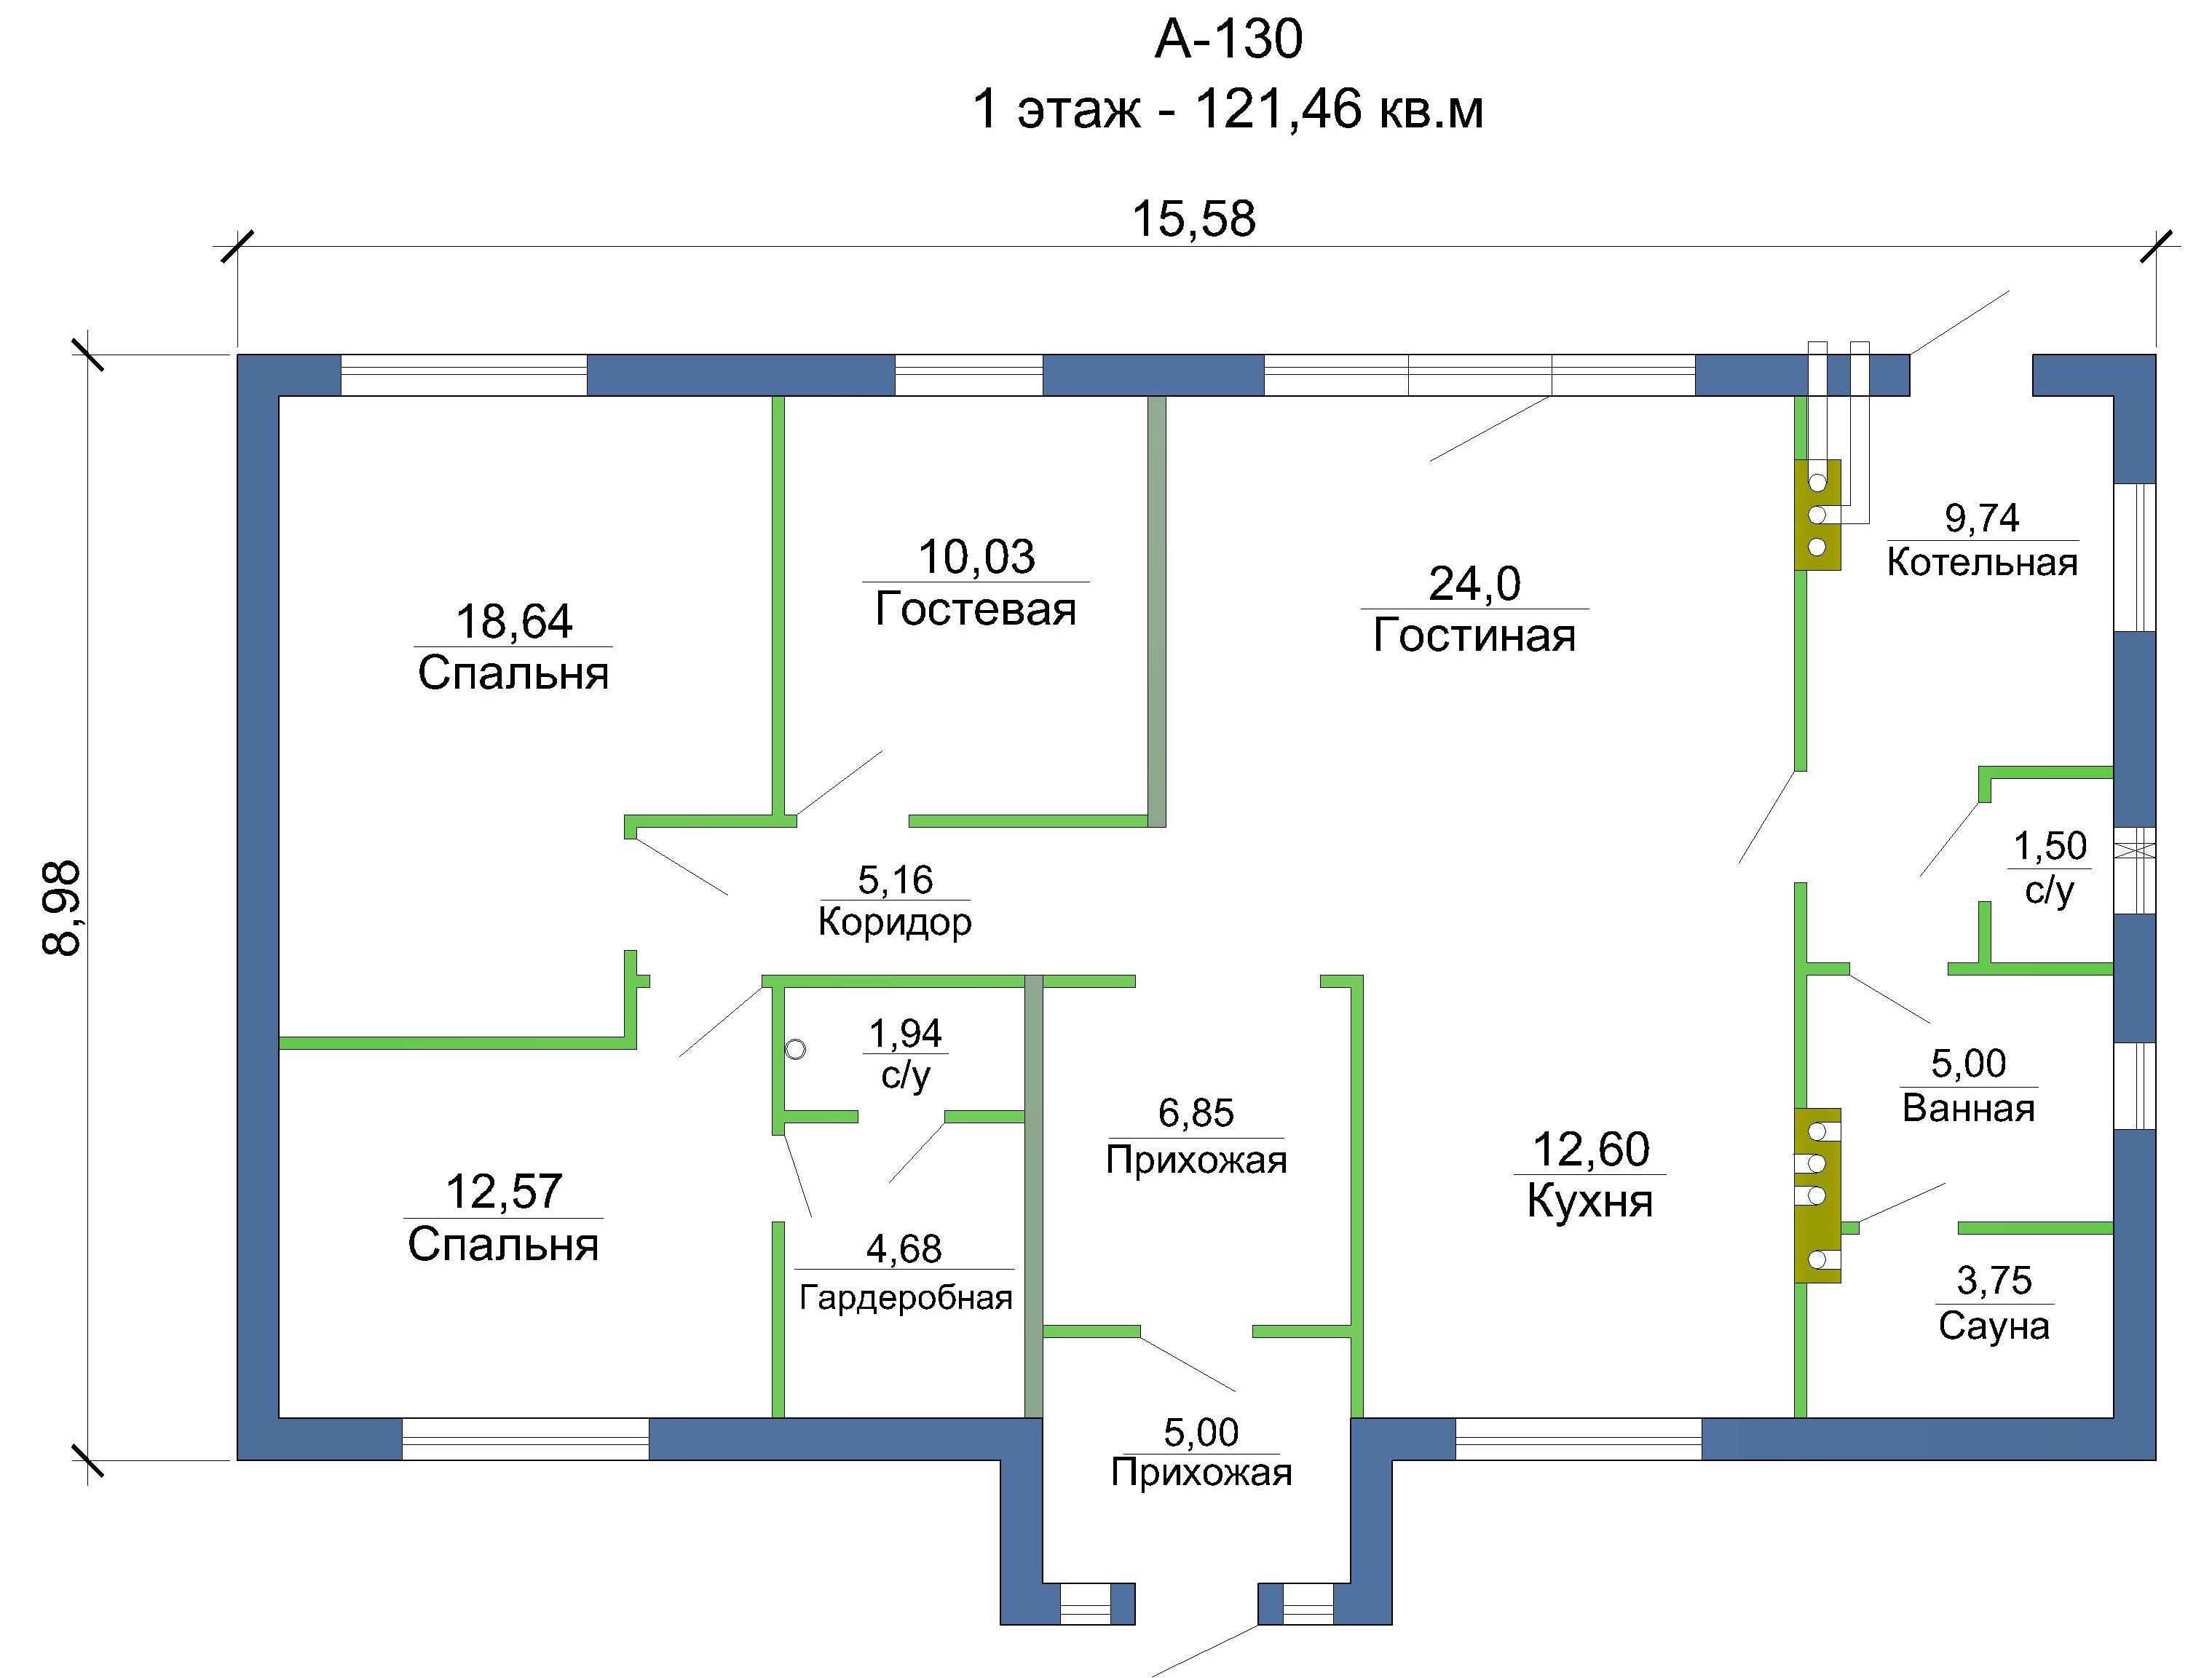 Проект каркасного дома 121 кв. м / Артикул А-130 план